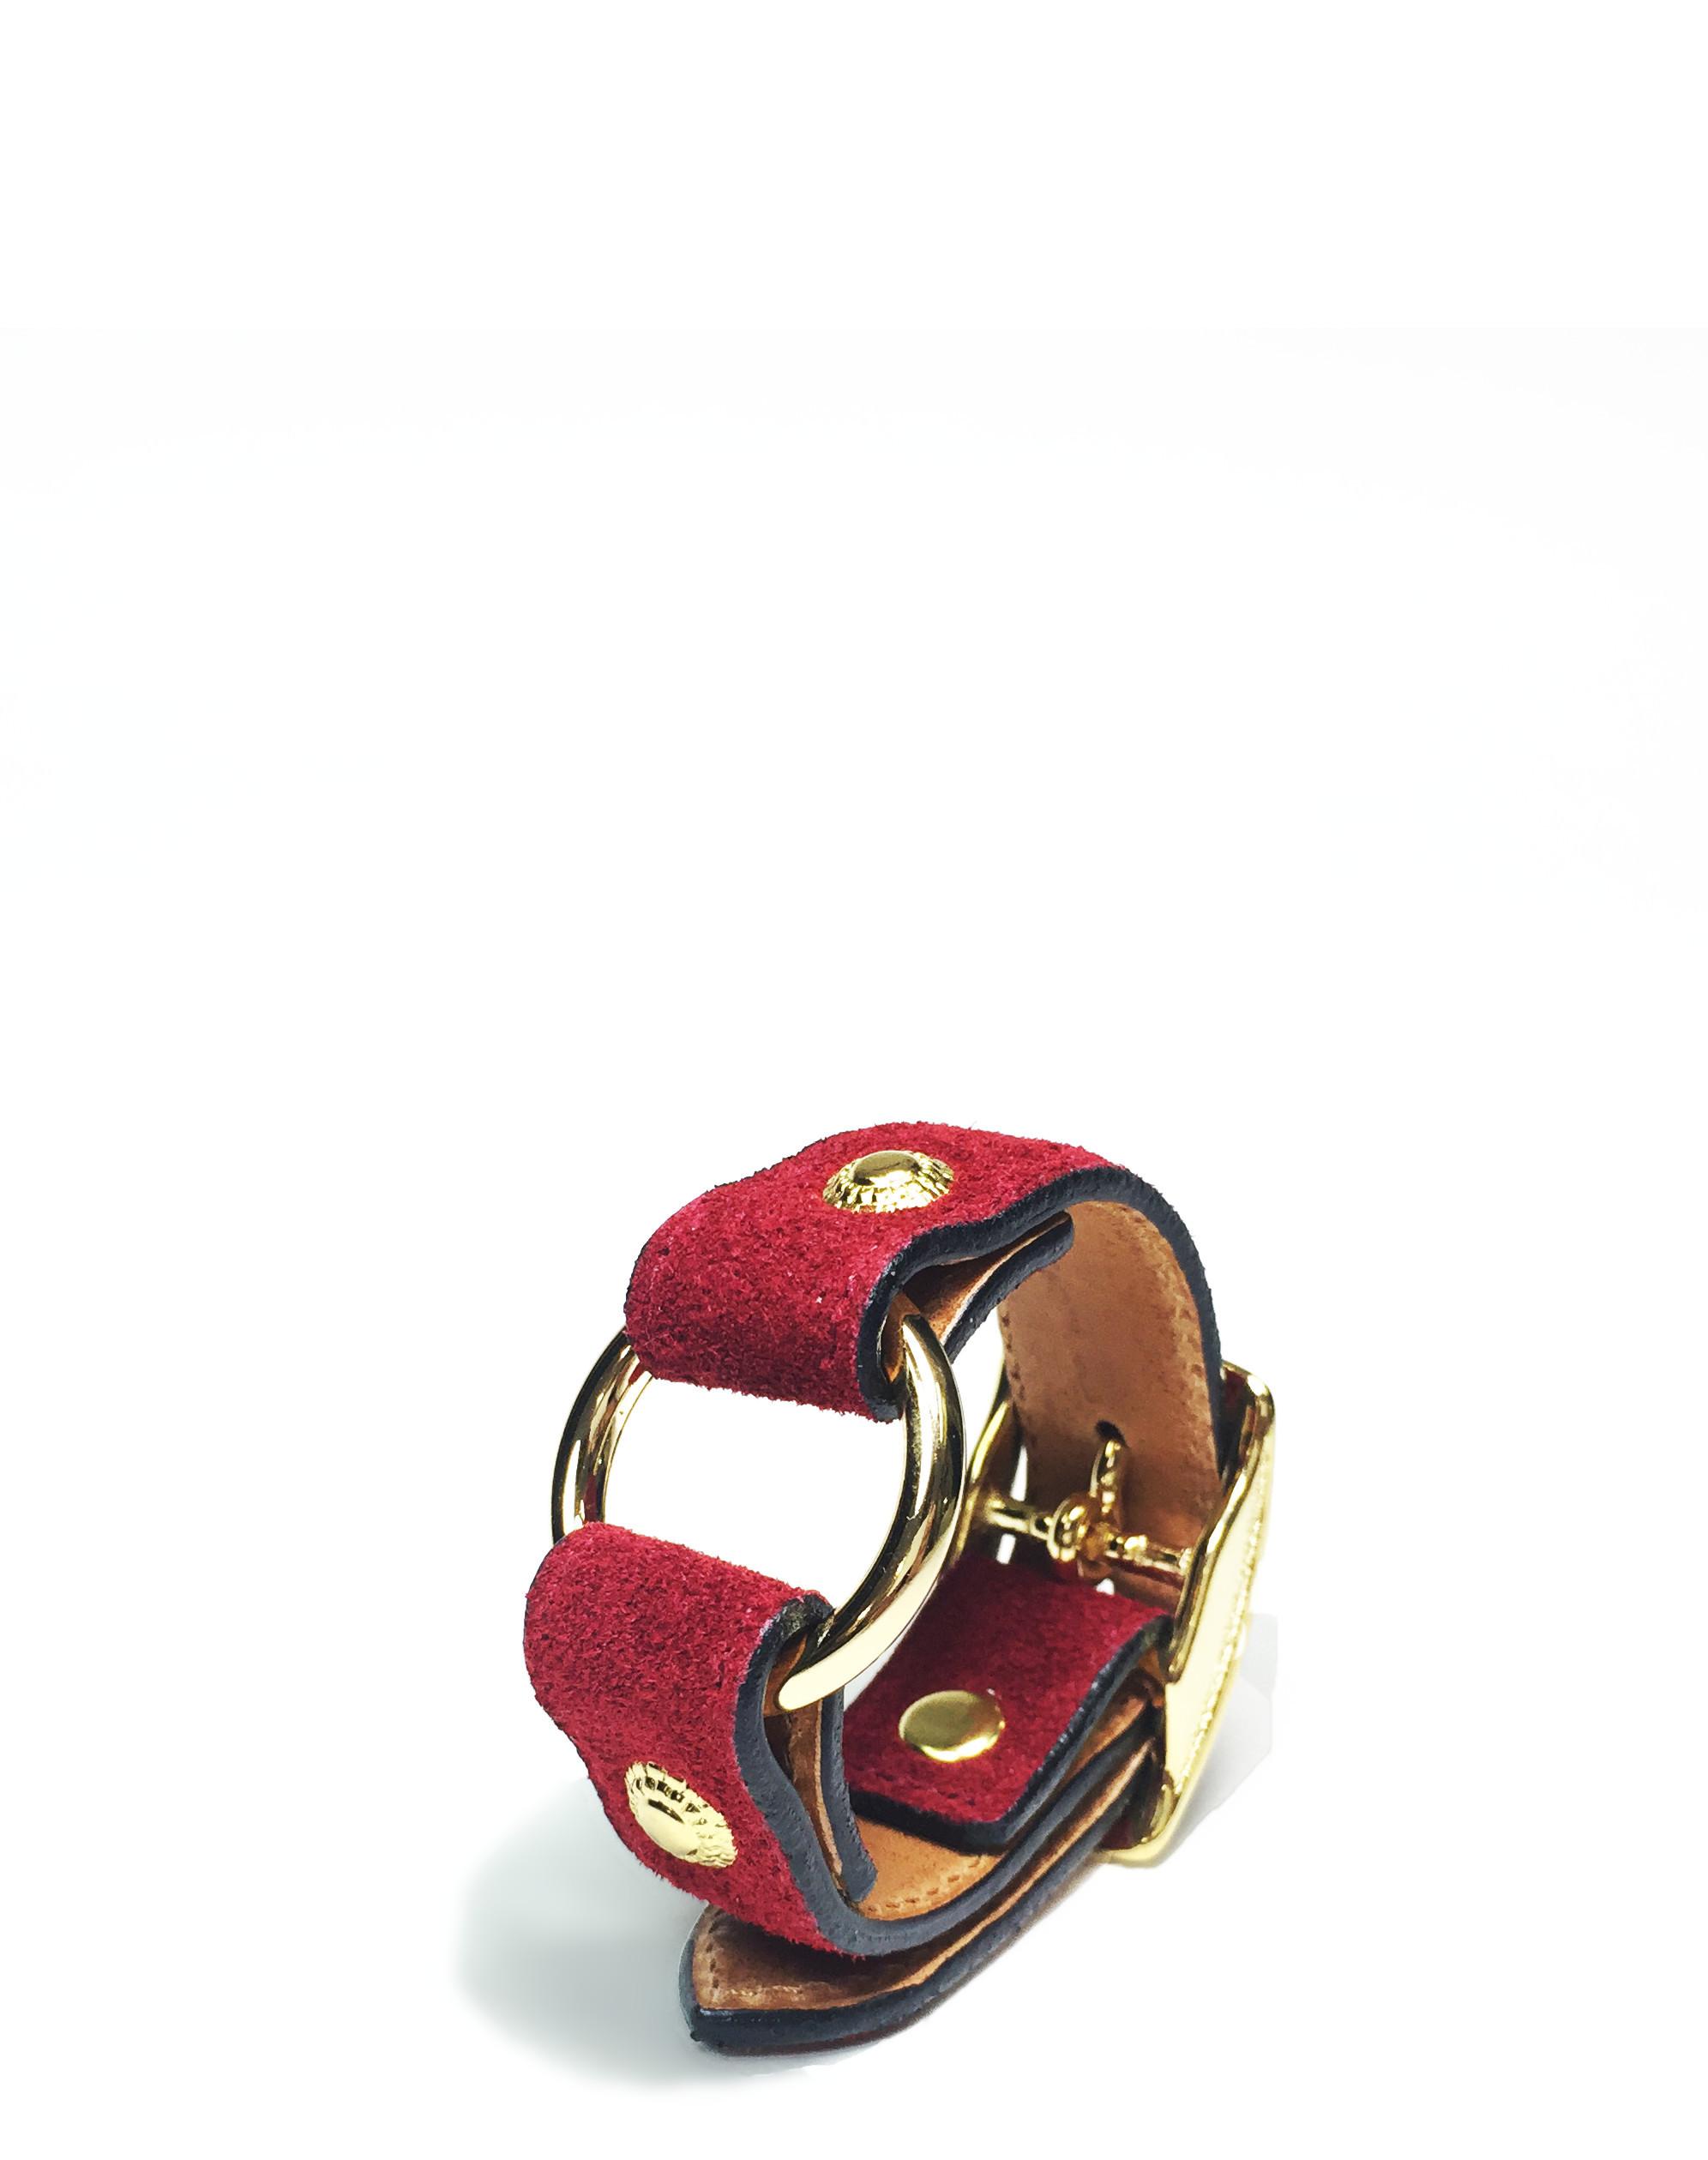 nahezugleich / Suede Ring bracelet - 画像4